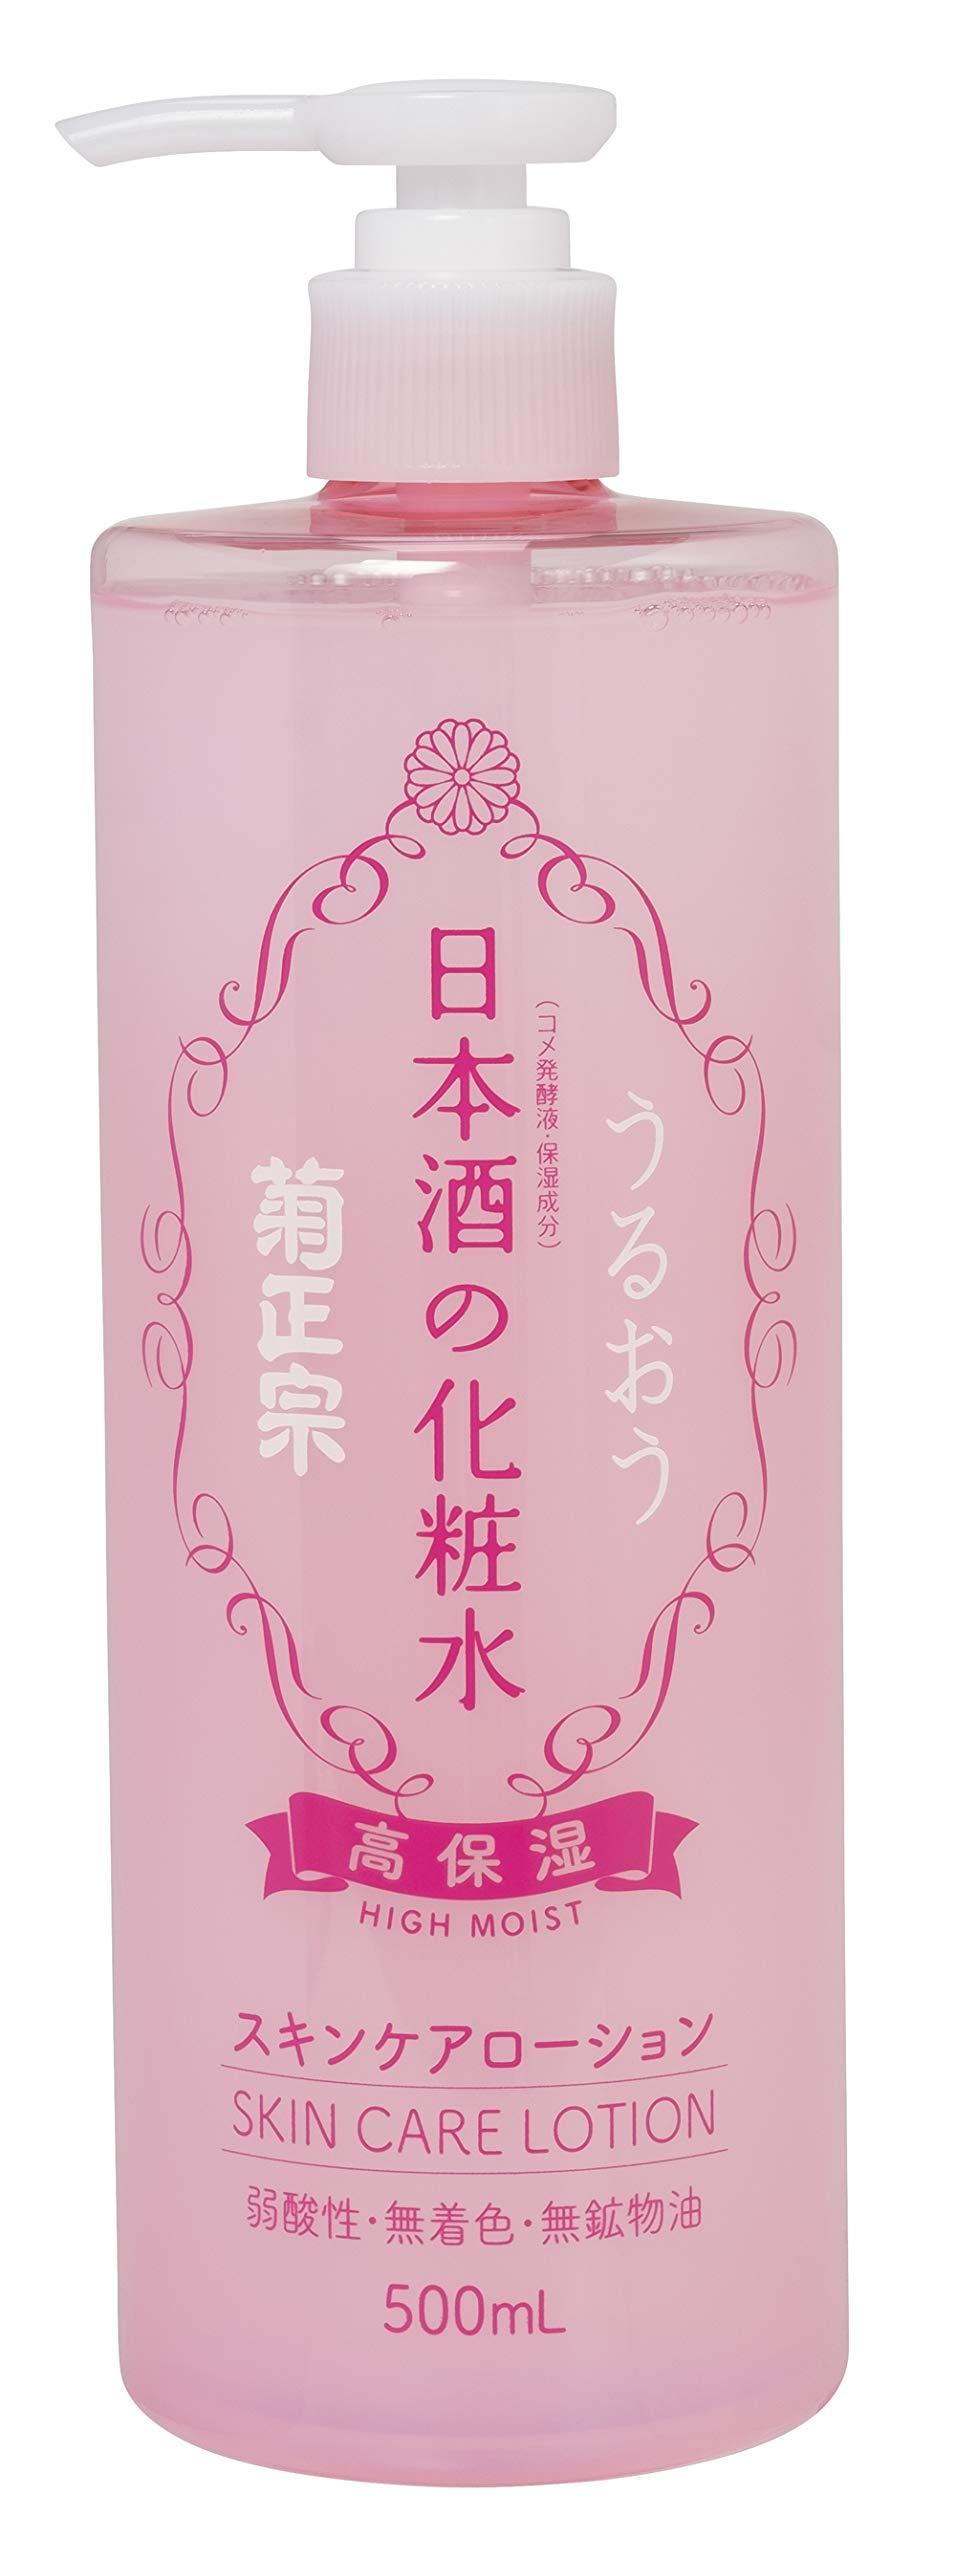 Sake High Moisture Skin Lotion Toner By Kikumasamune for Women 16.9 Oz Lotion, 16.9 Ounce by Kikumasamune